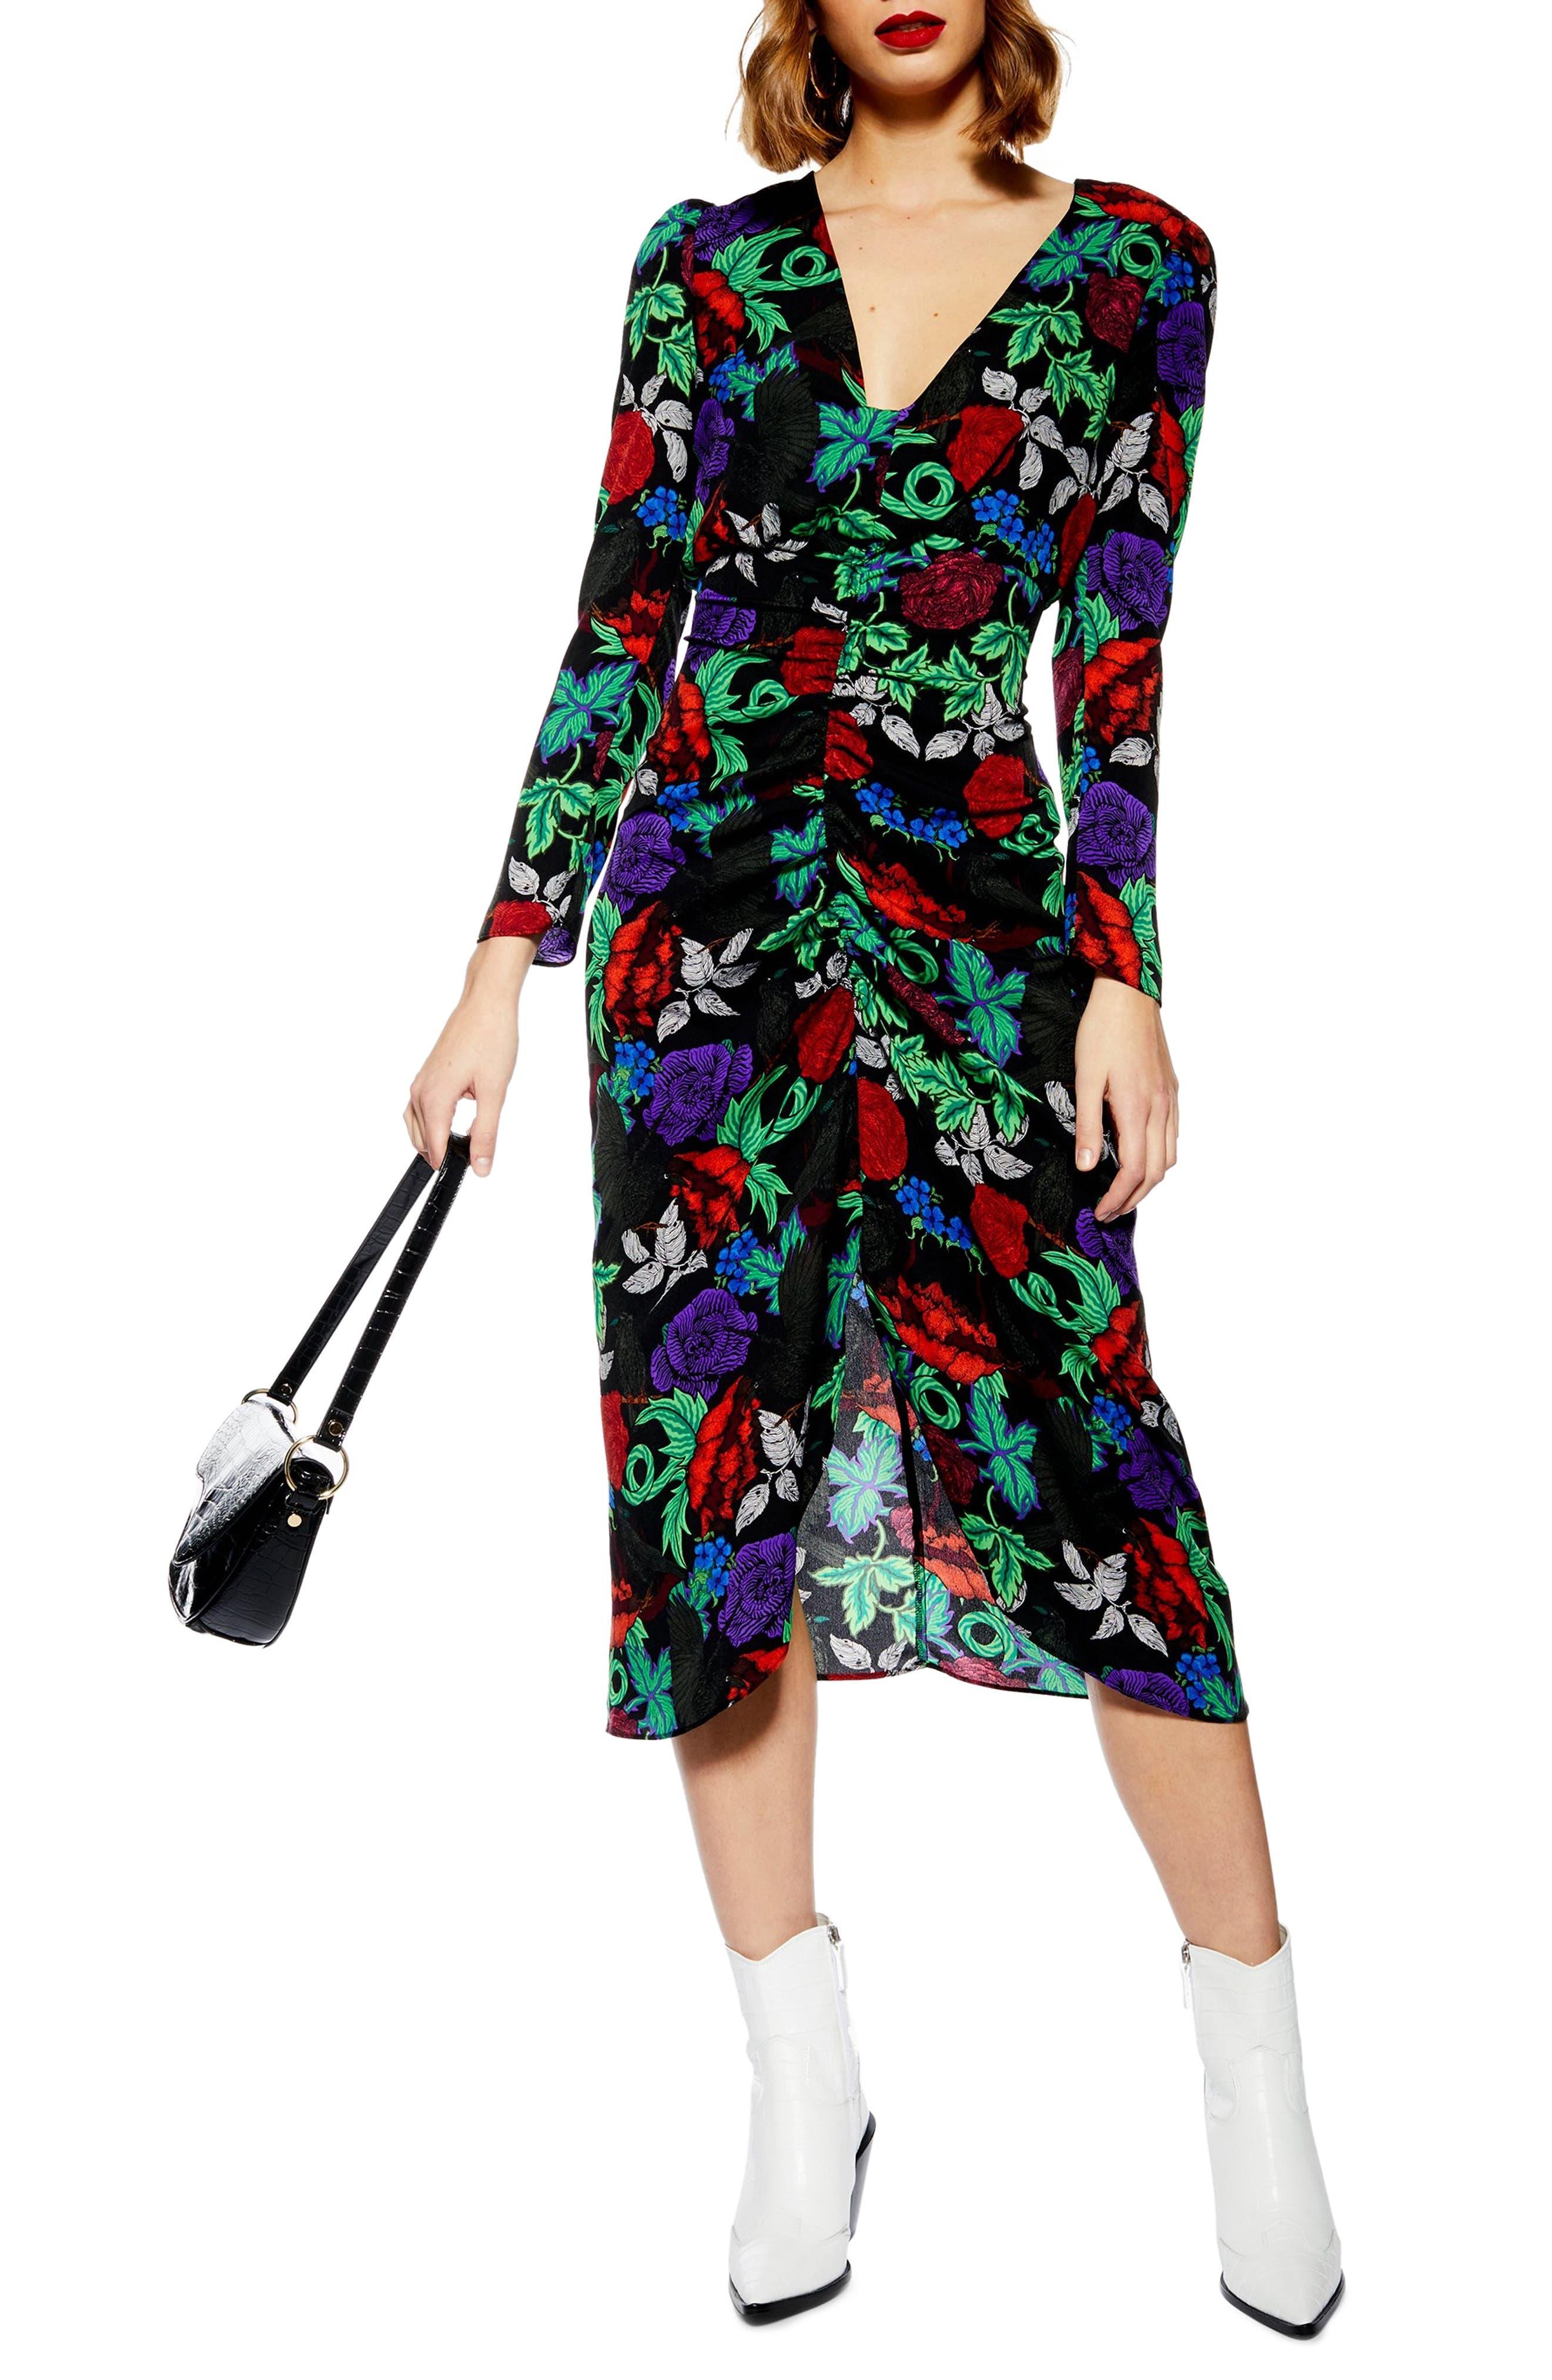 Topshop Raven Floral Midi Dress, US (fits like 6-8) - Black